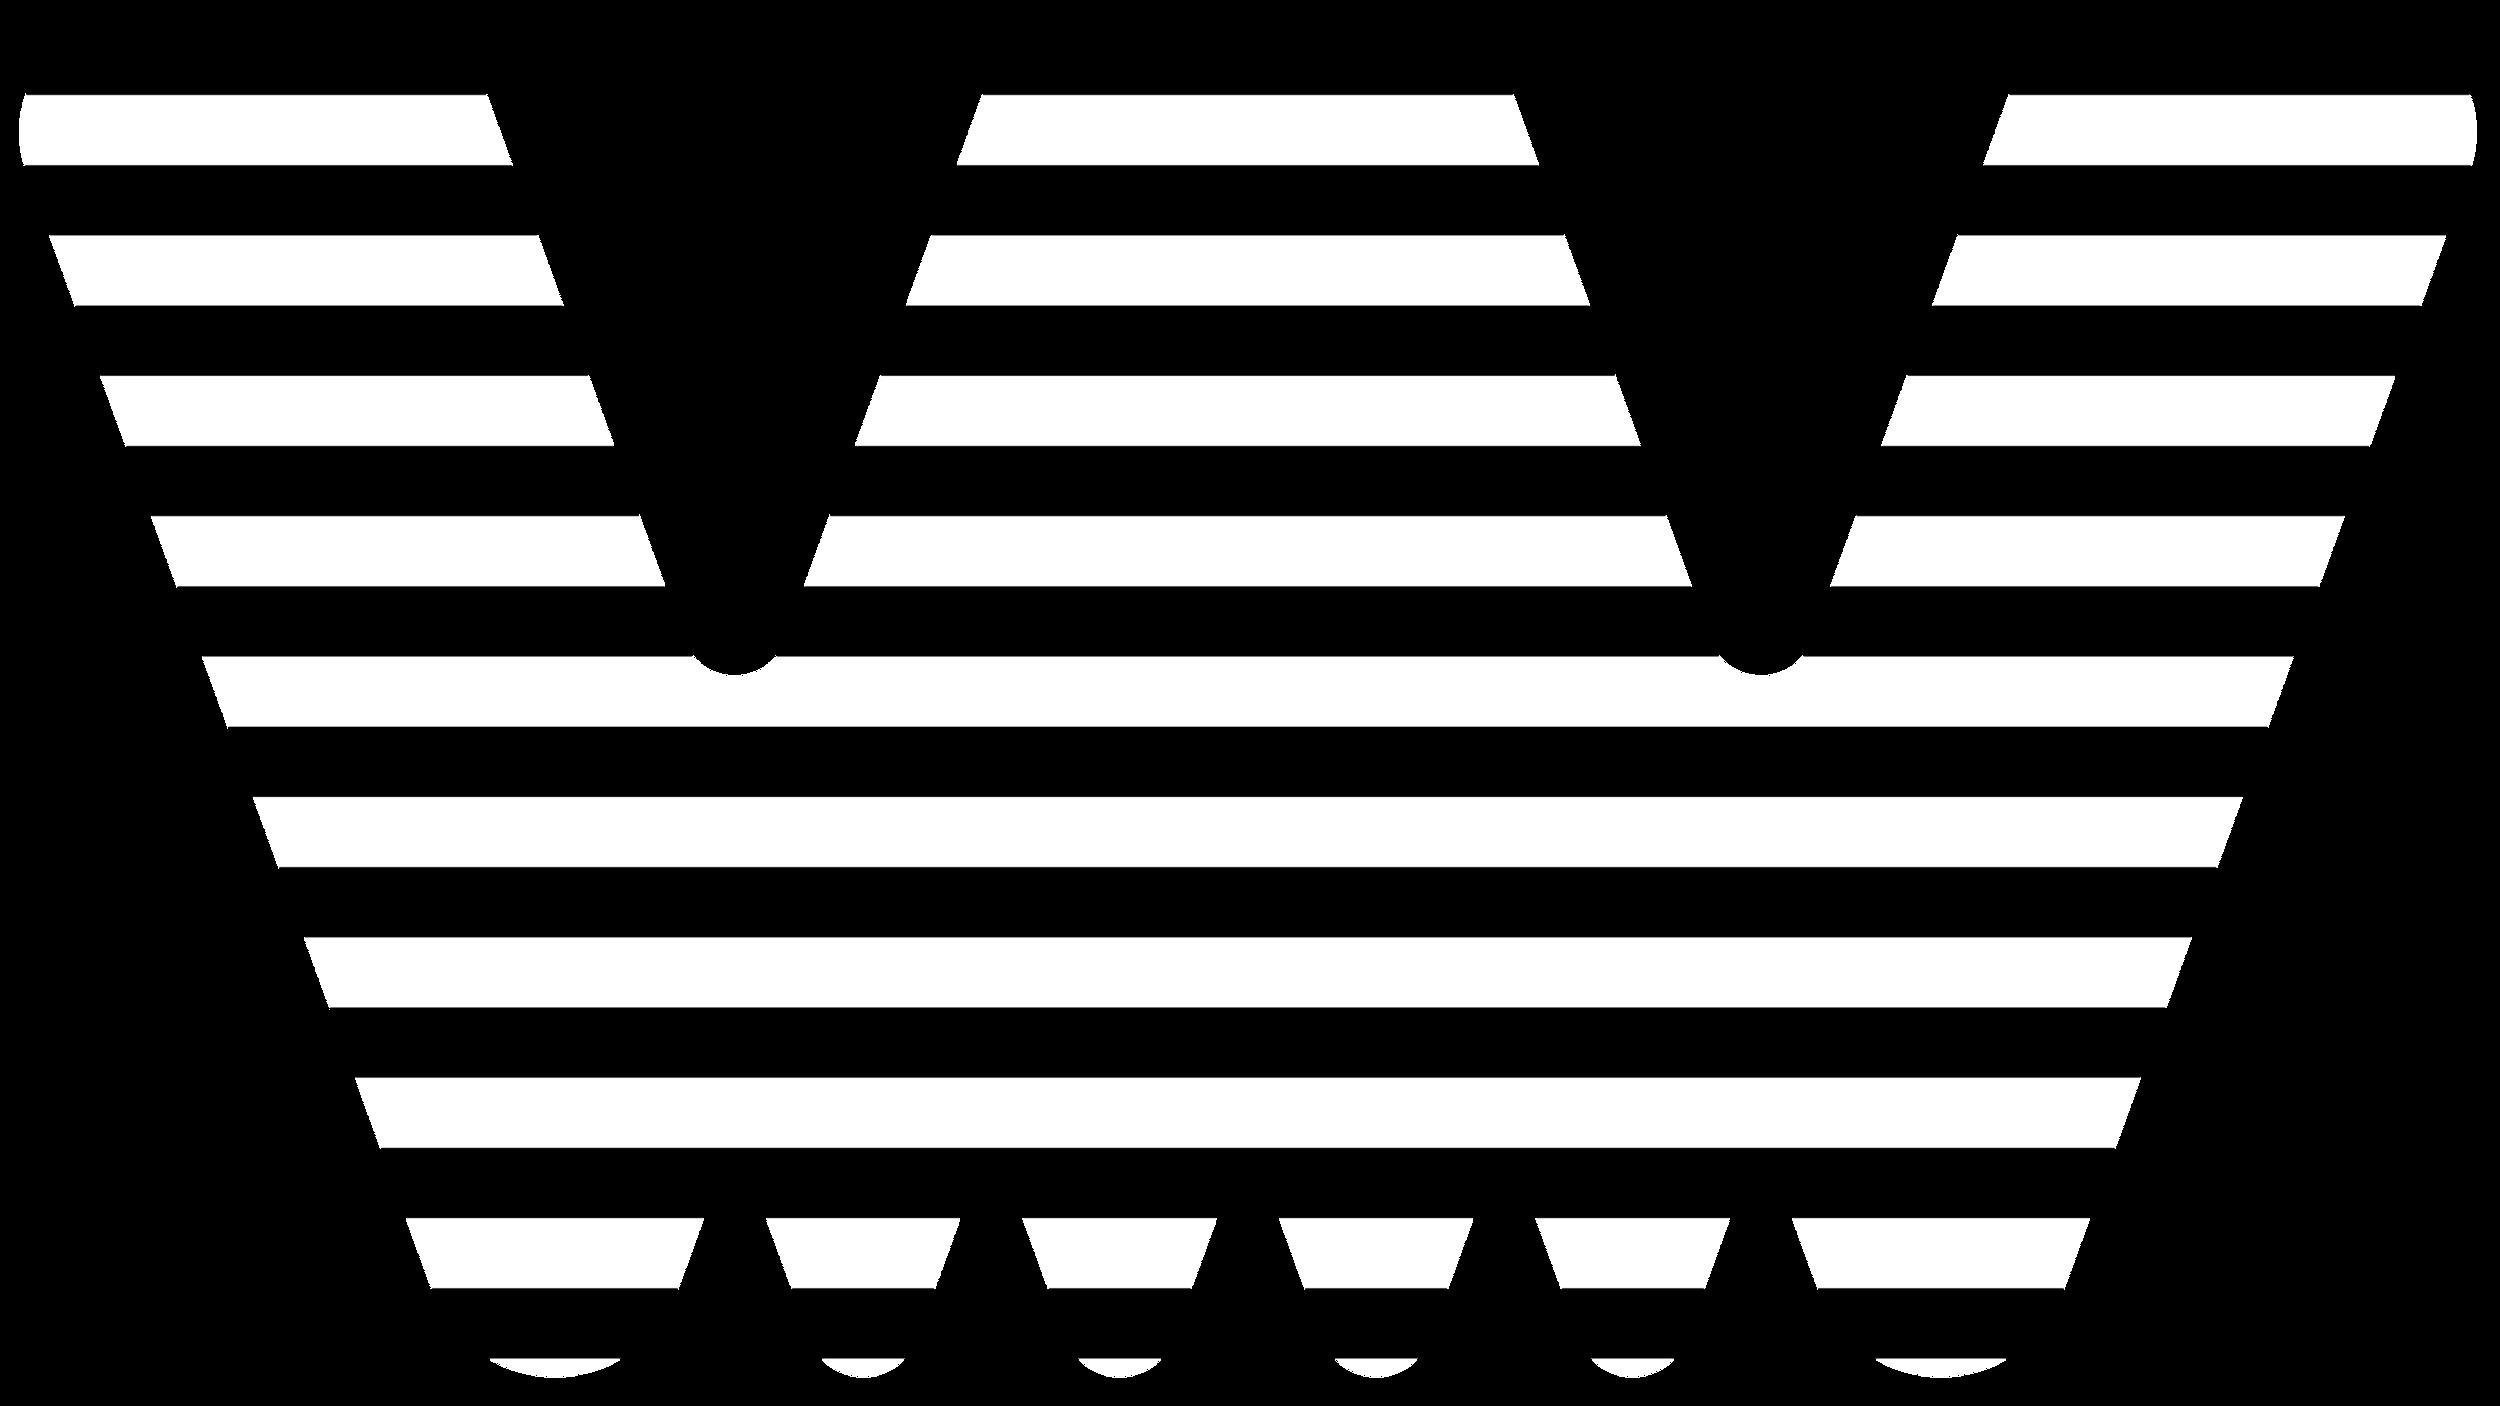 WildDingo_W_Symbol_RGB_Patterns-09.png